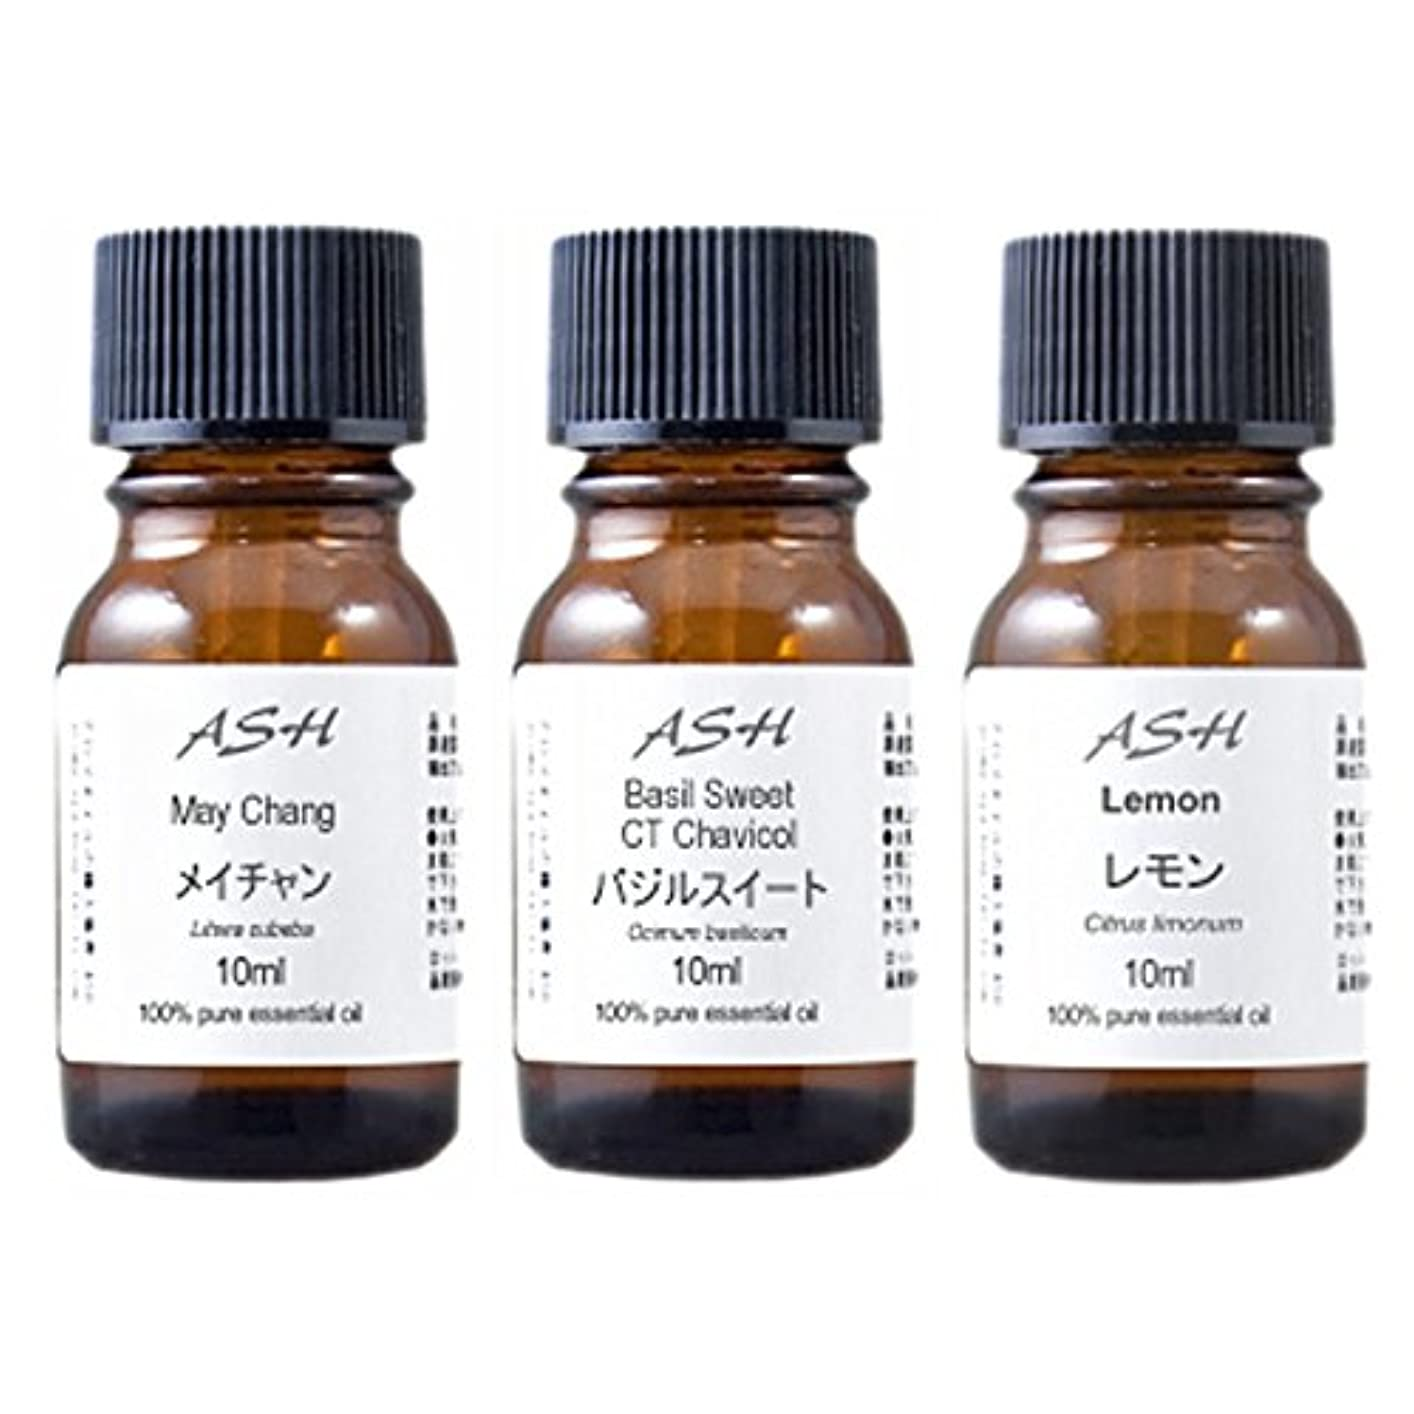 ASH エッセンシャルオイル 10mlx3本セット【アロマオイル 精油】(コンセントレーション)バジルスイート メイチャン レモン AEAJ表示基準適合認定精油